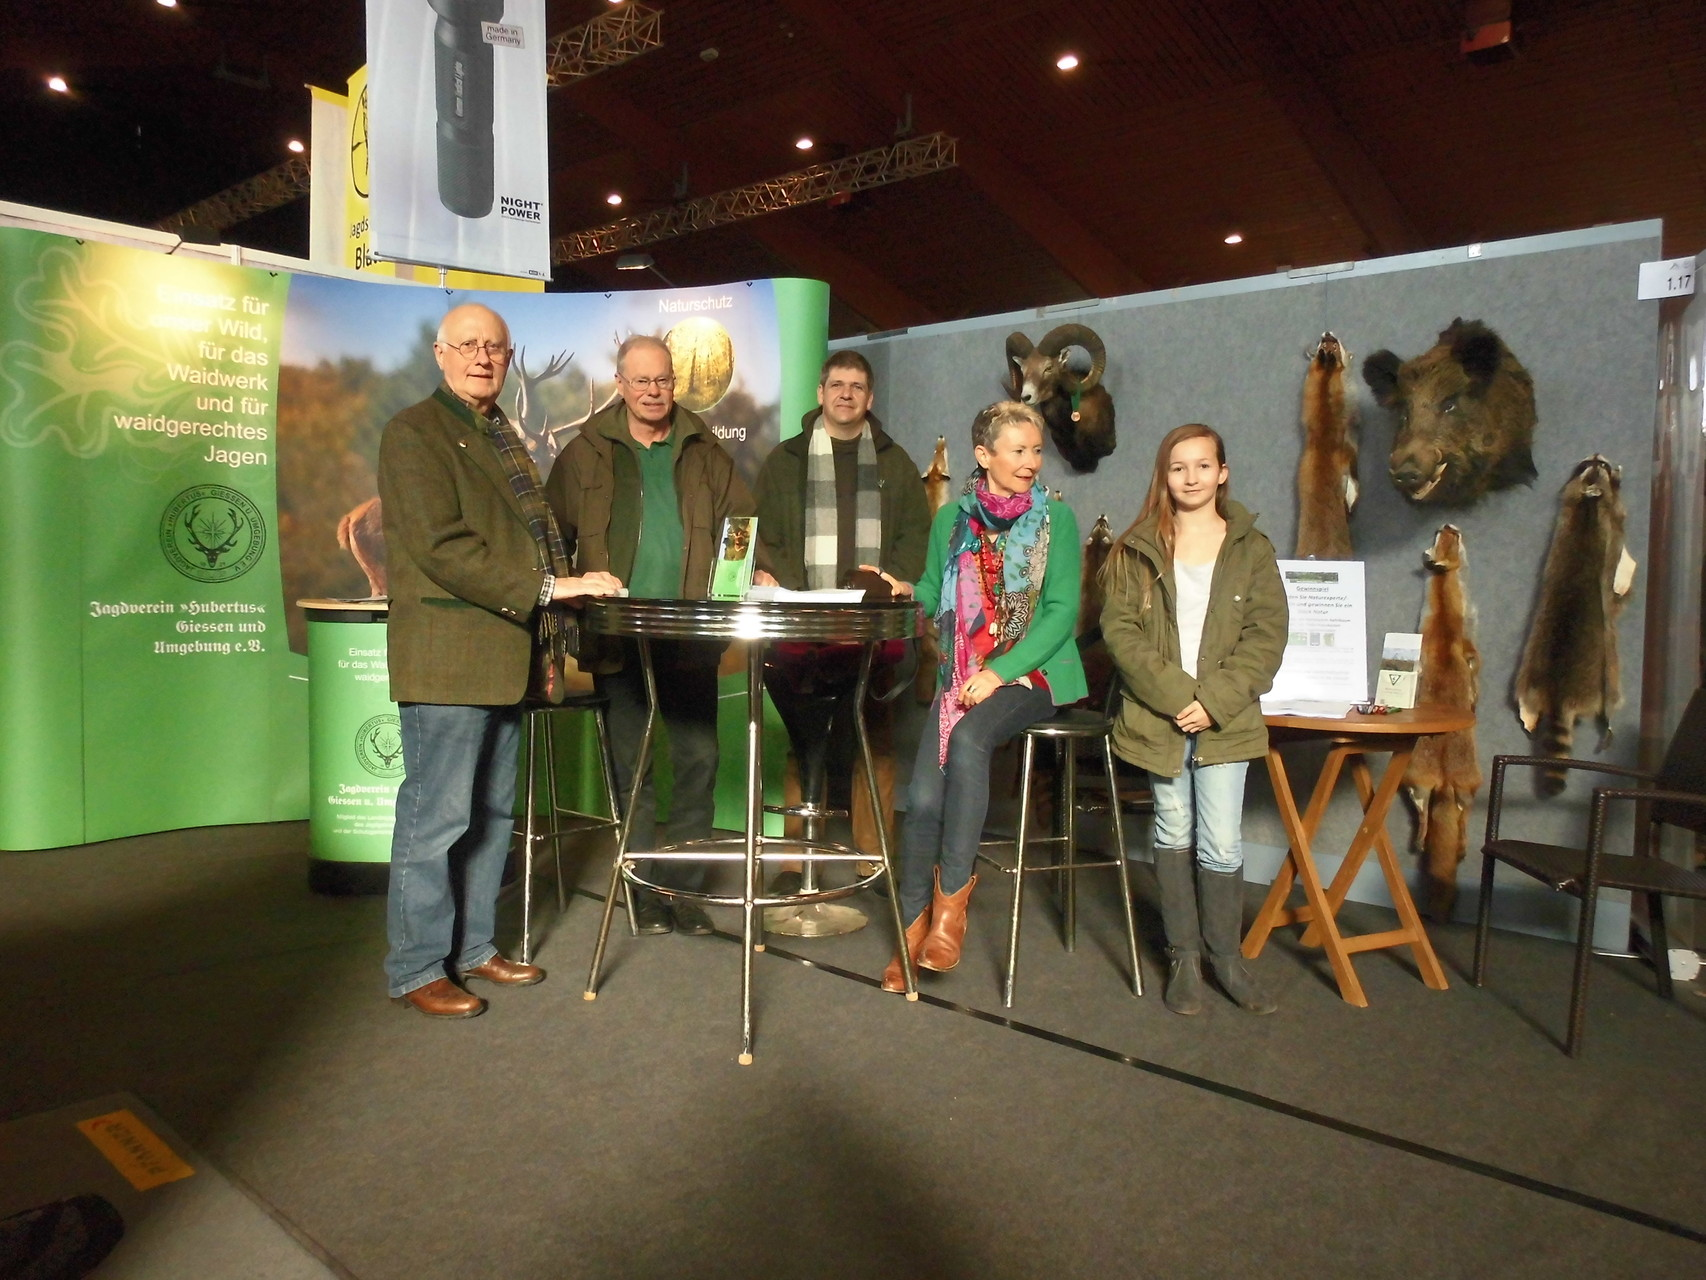 Infostand in Kooperation mit dem Jagdverein Hubertus Gießen e.V.in Alsfeld